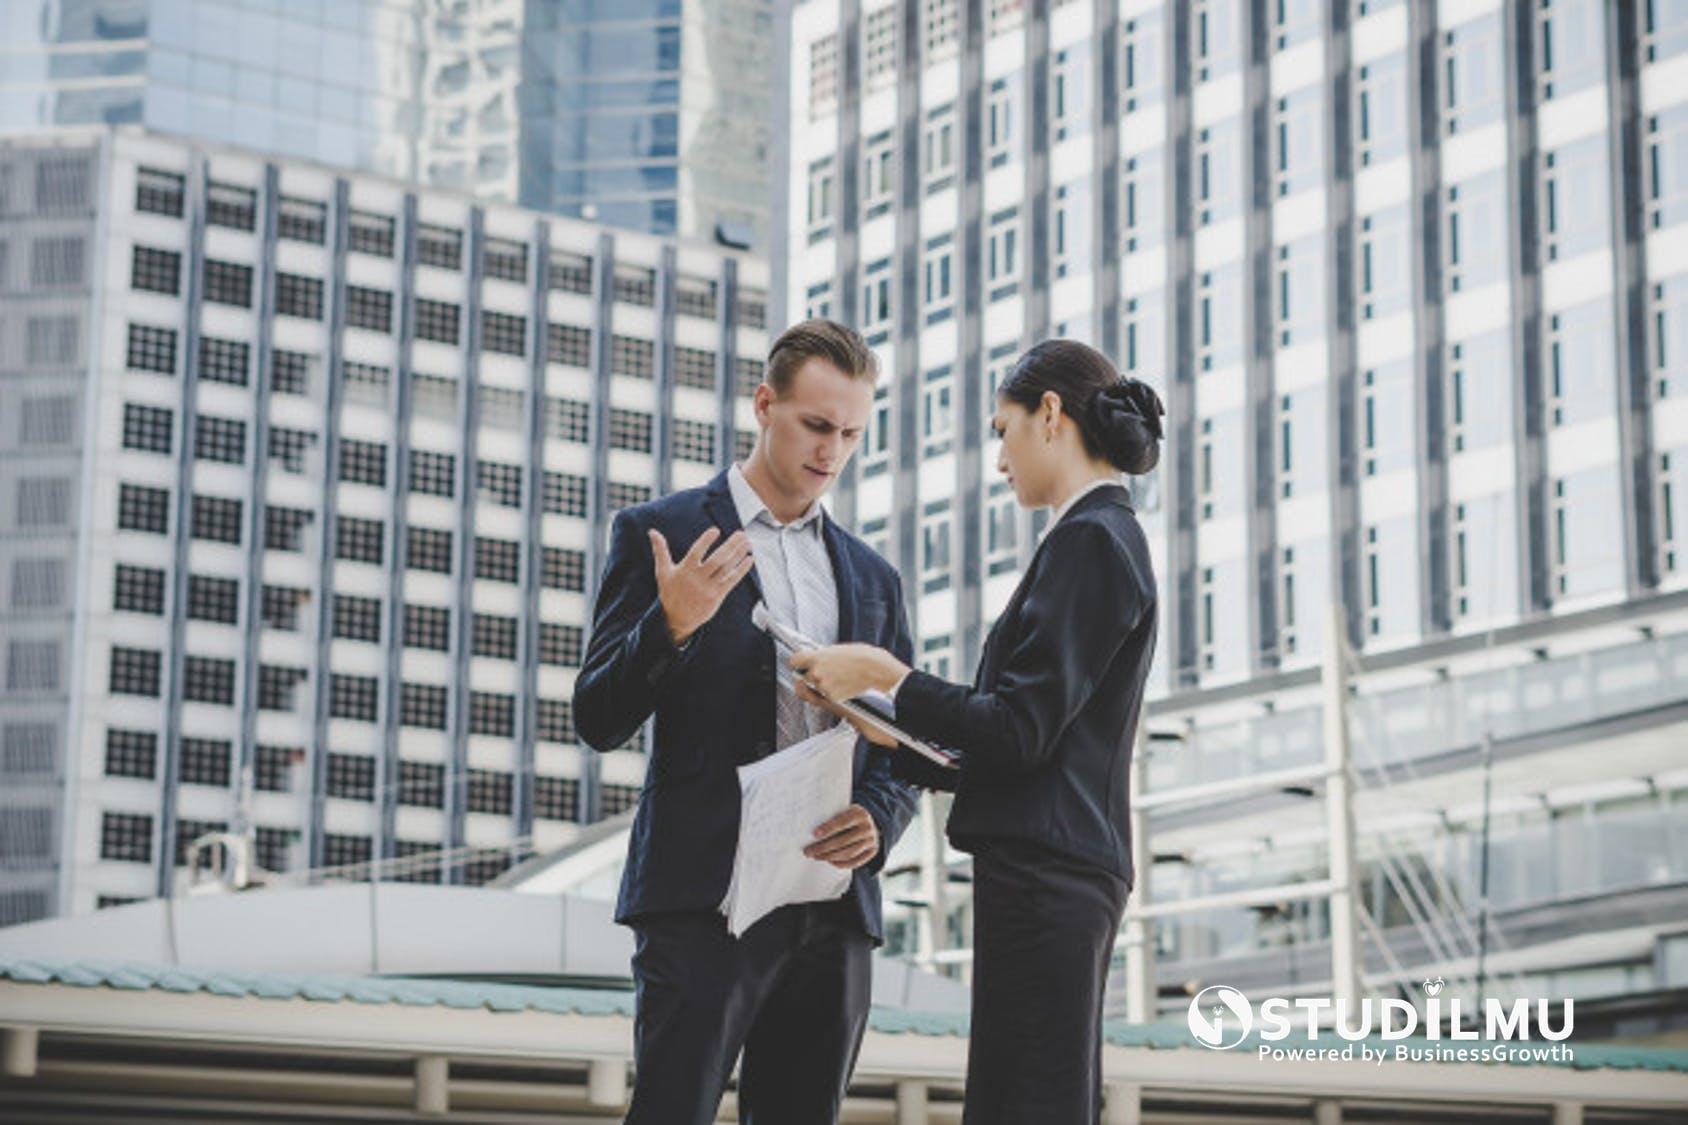 STUDILMU Career Advice - Memberikan Umpan Balik Konstruktif